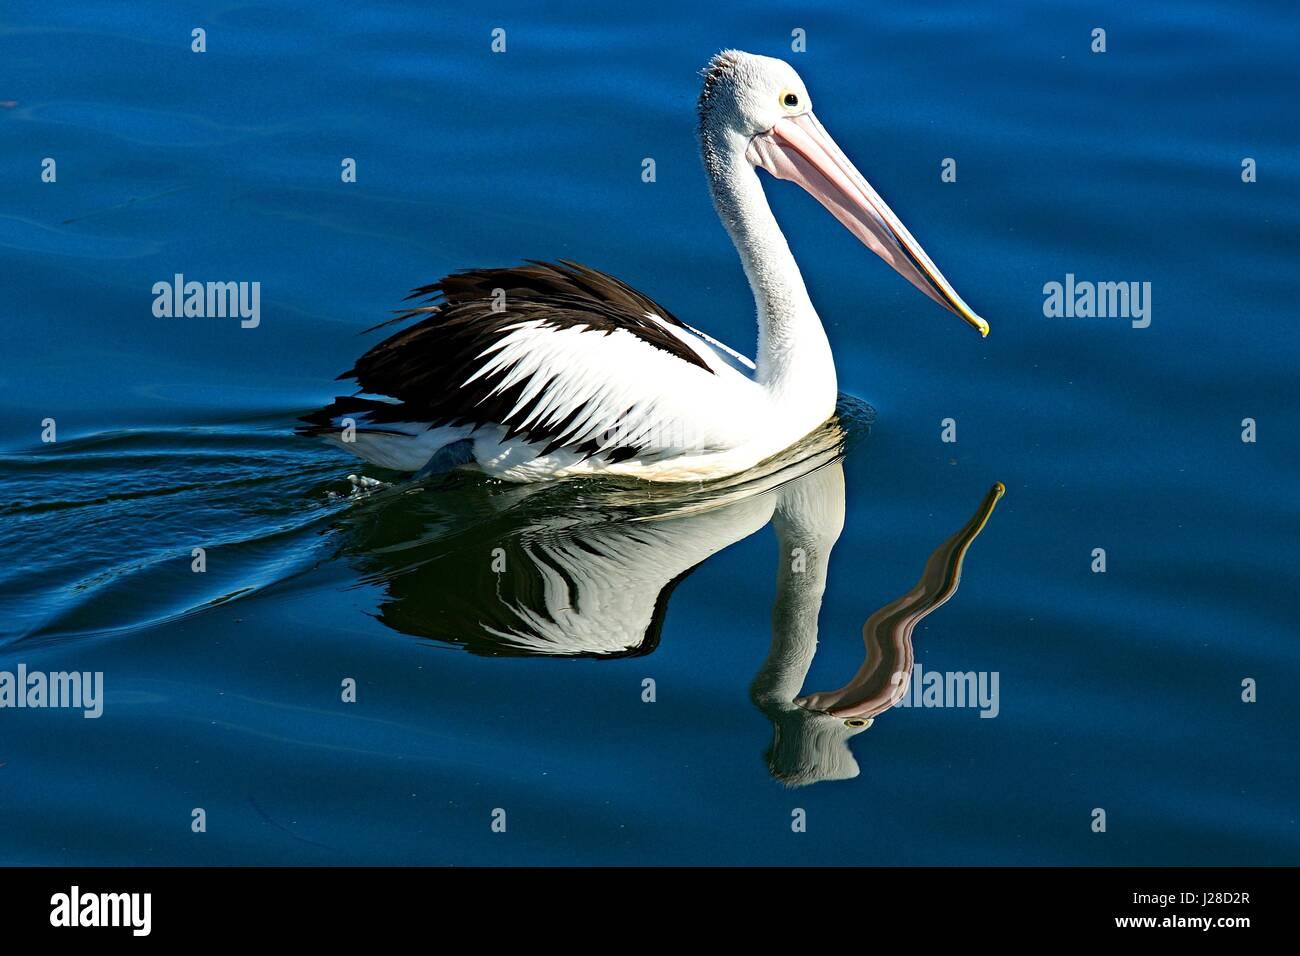 Black and white Australian Pelican Bird, Pelecanus conspicillatus, close-up swimming in blue salt water with clear - Stock Image